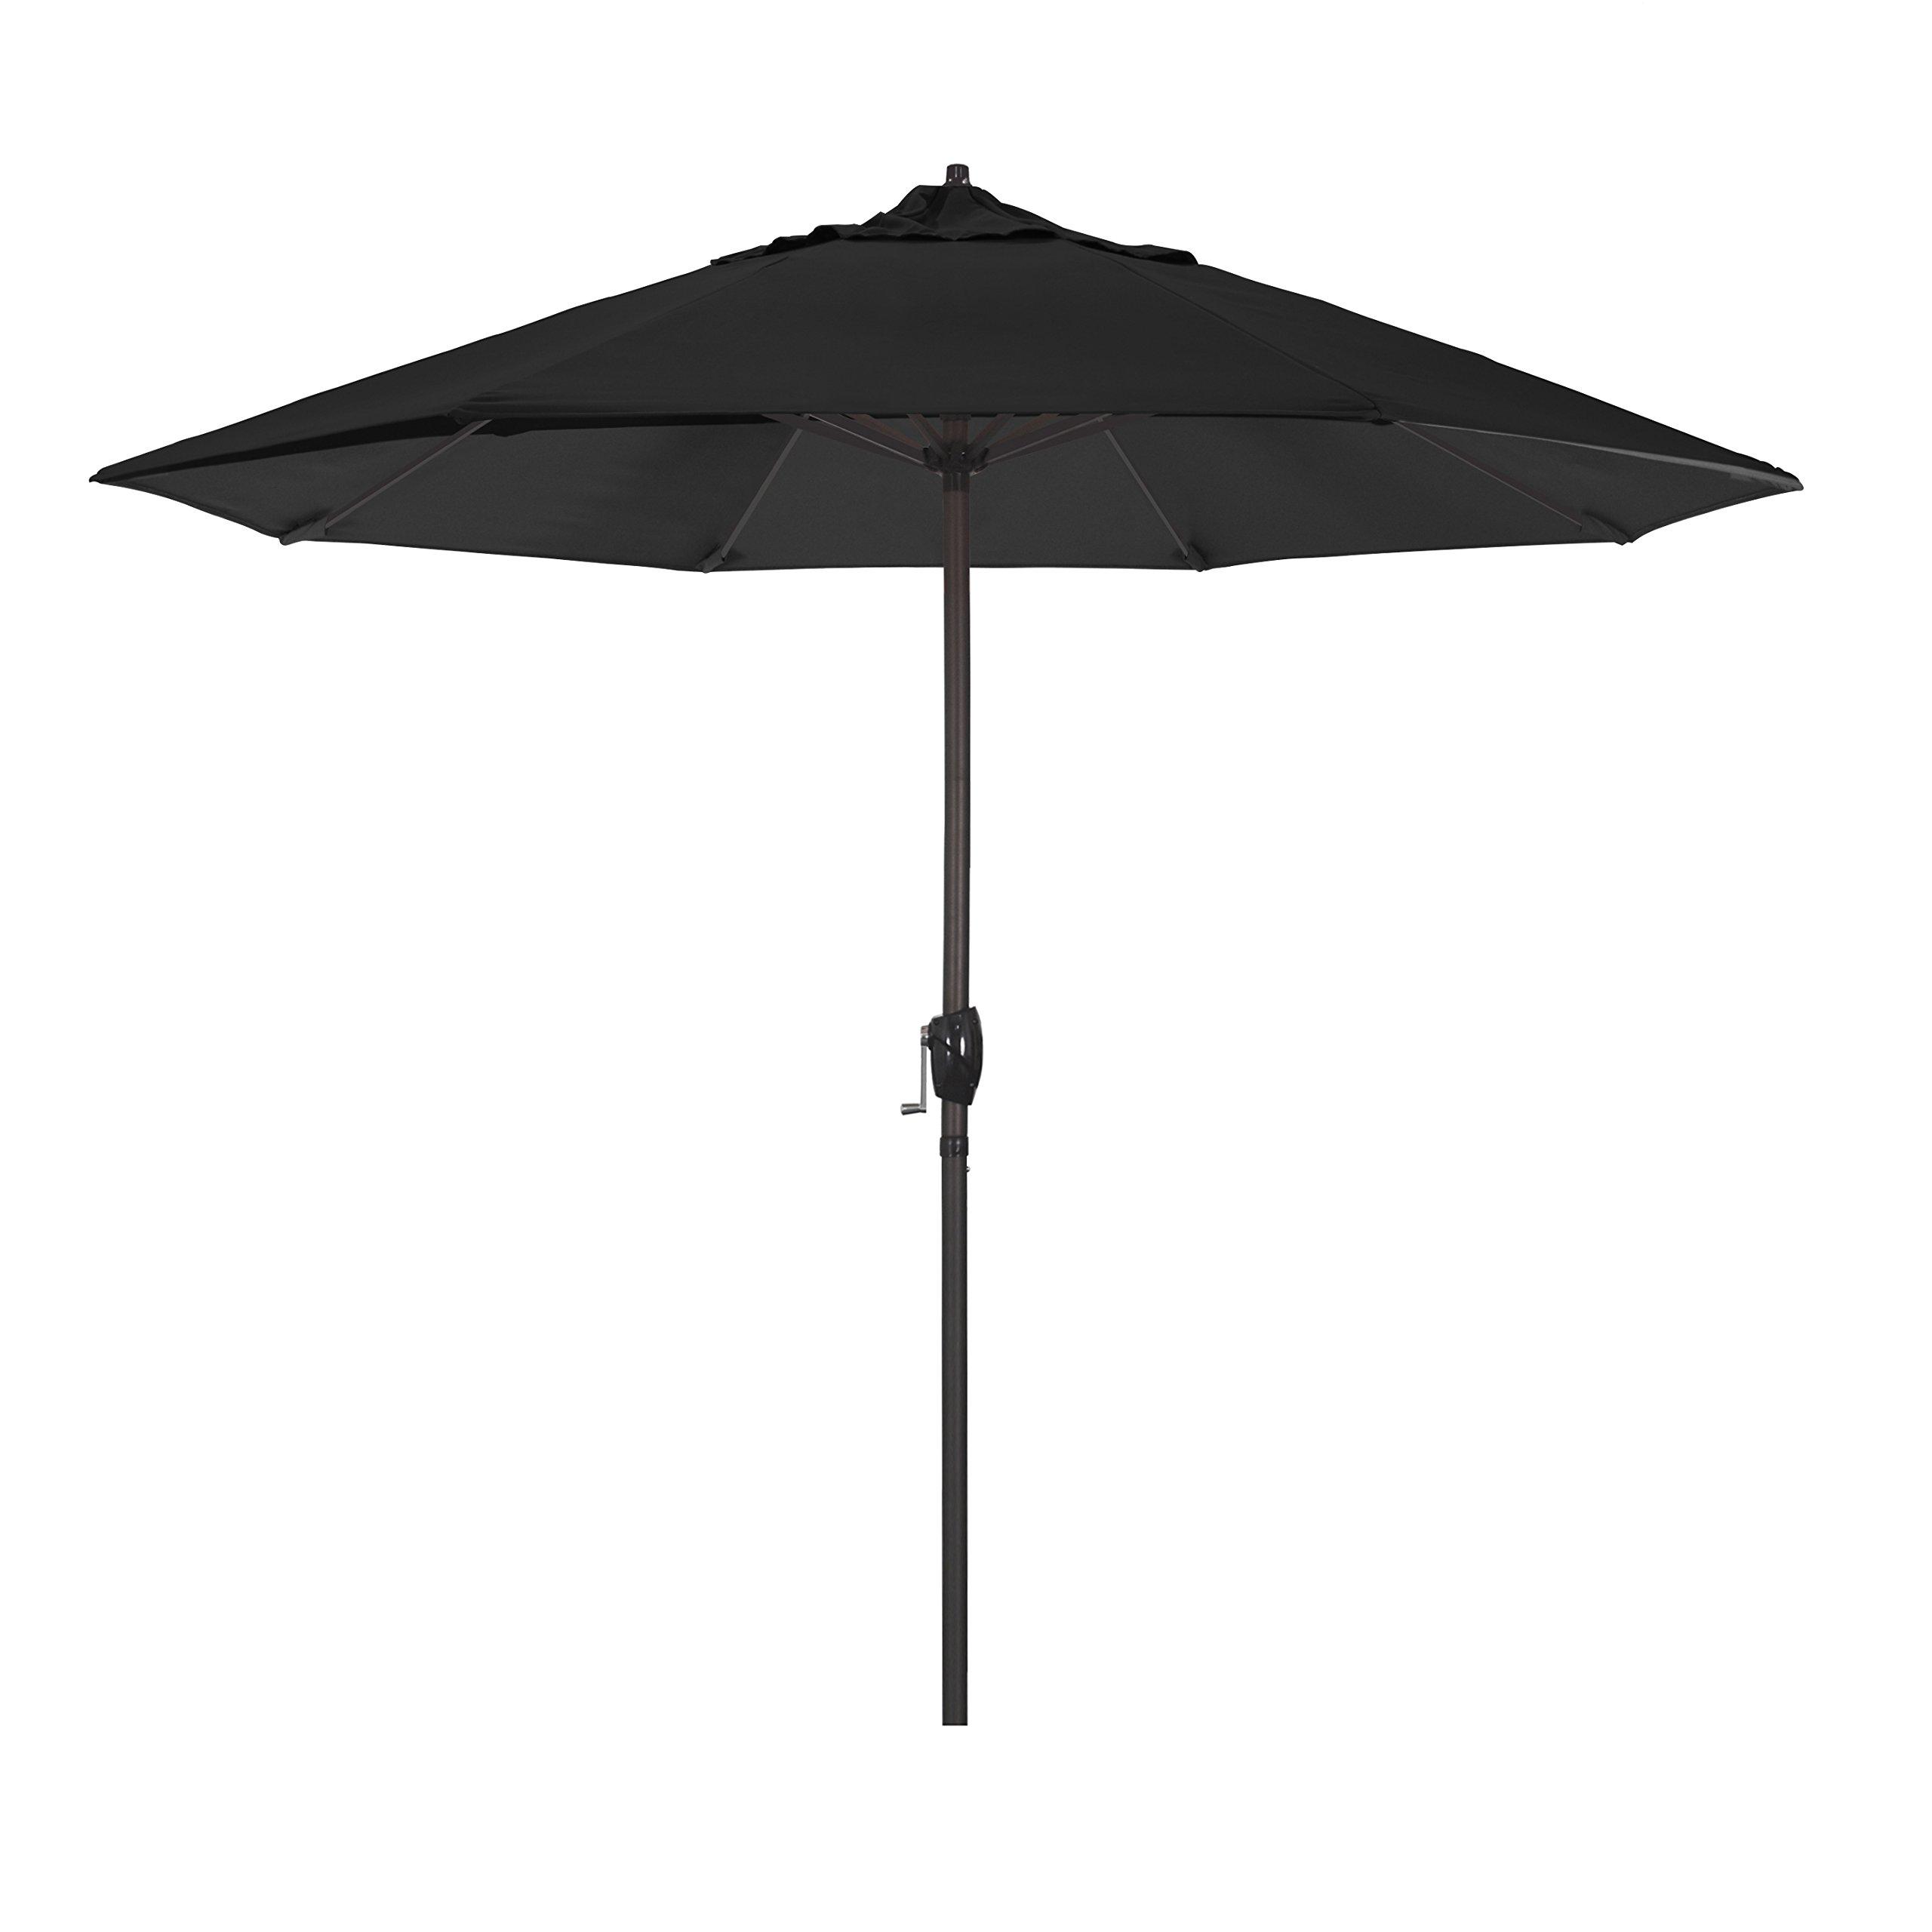 California Umbrella 9' Round Aluminum Market Umbrella, Crank Lift, Auto Tilt, Bronze Pole, Sunbrella Black Fabric